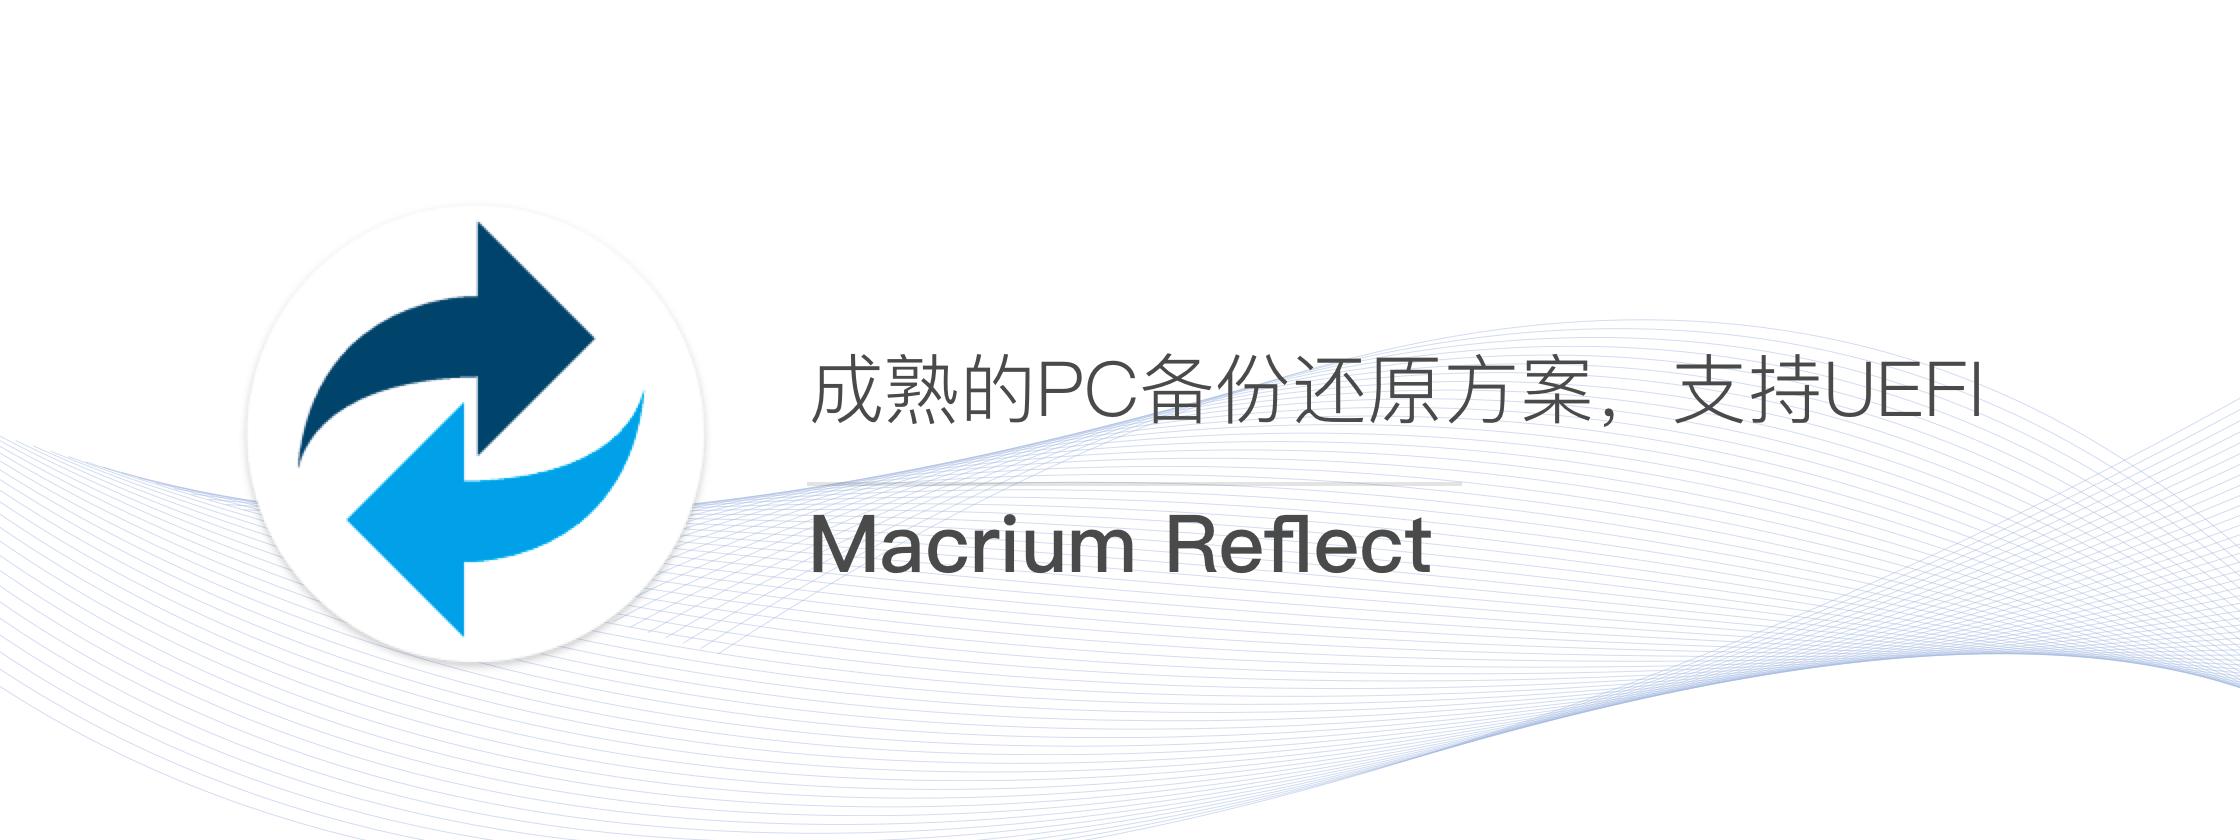 Macrium Reflect – 成熟的 PC 备份还原方案,支持 UEFI